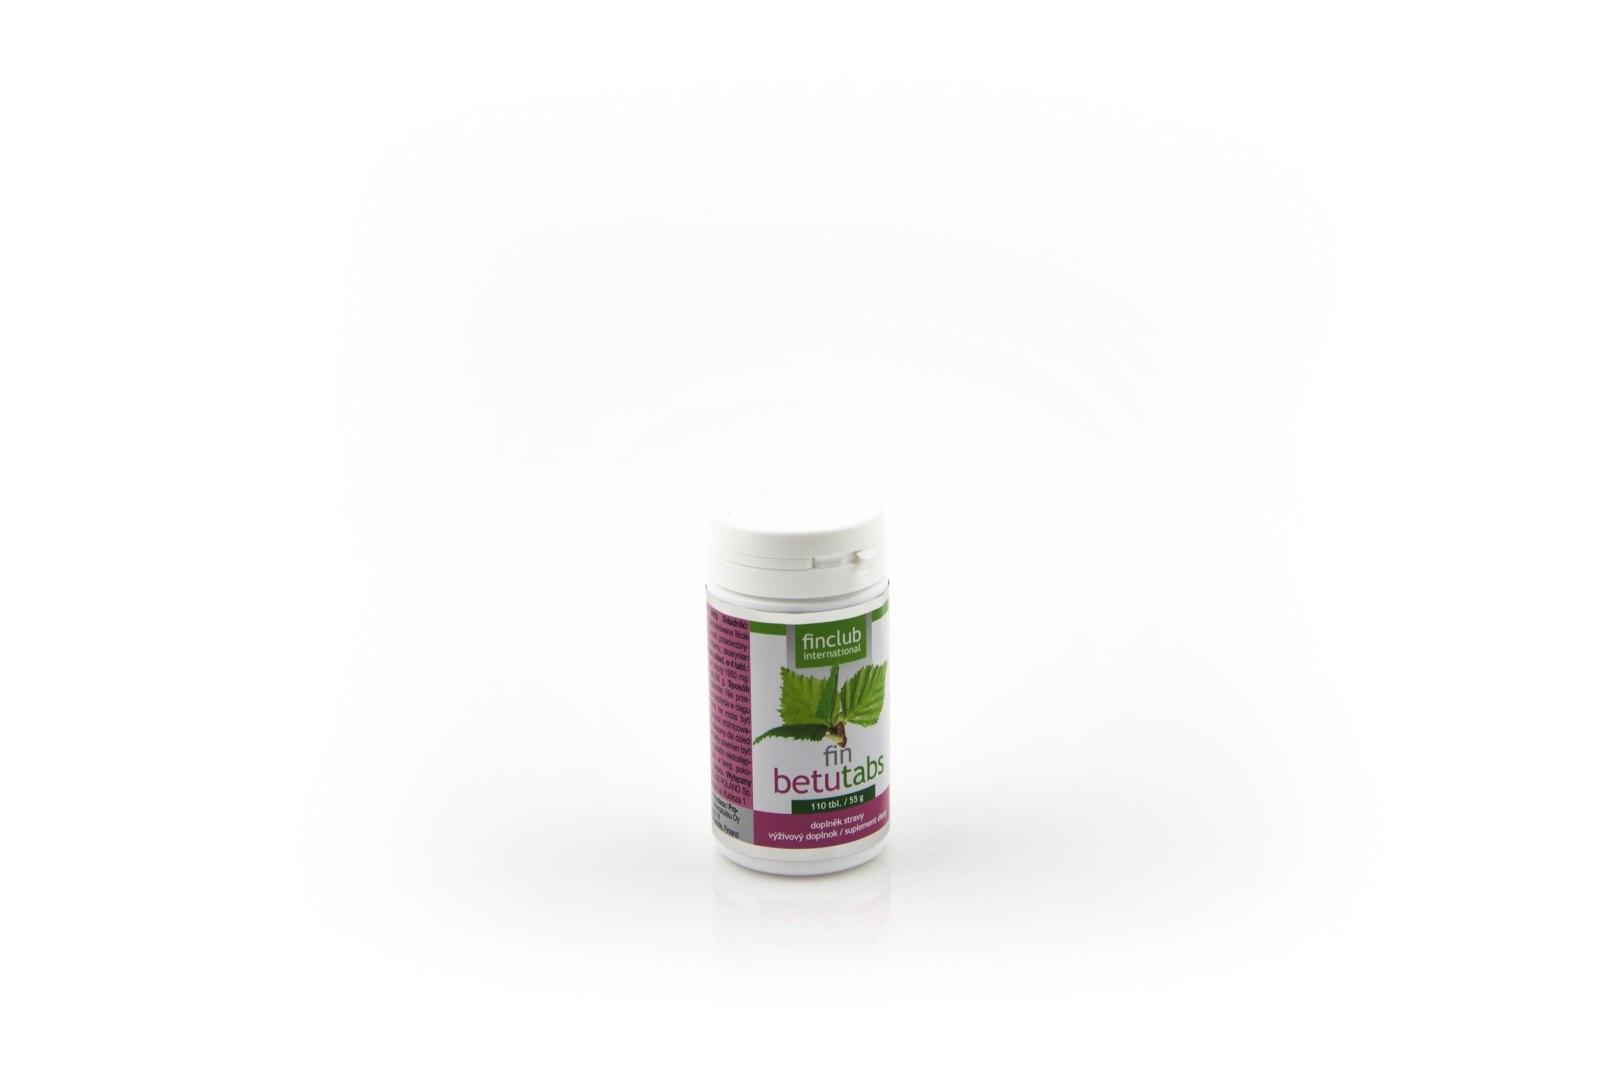 fin betutabs (ekstrakt z liści brzozy), 110 tabletek